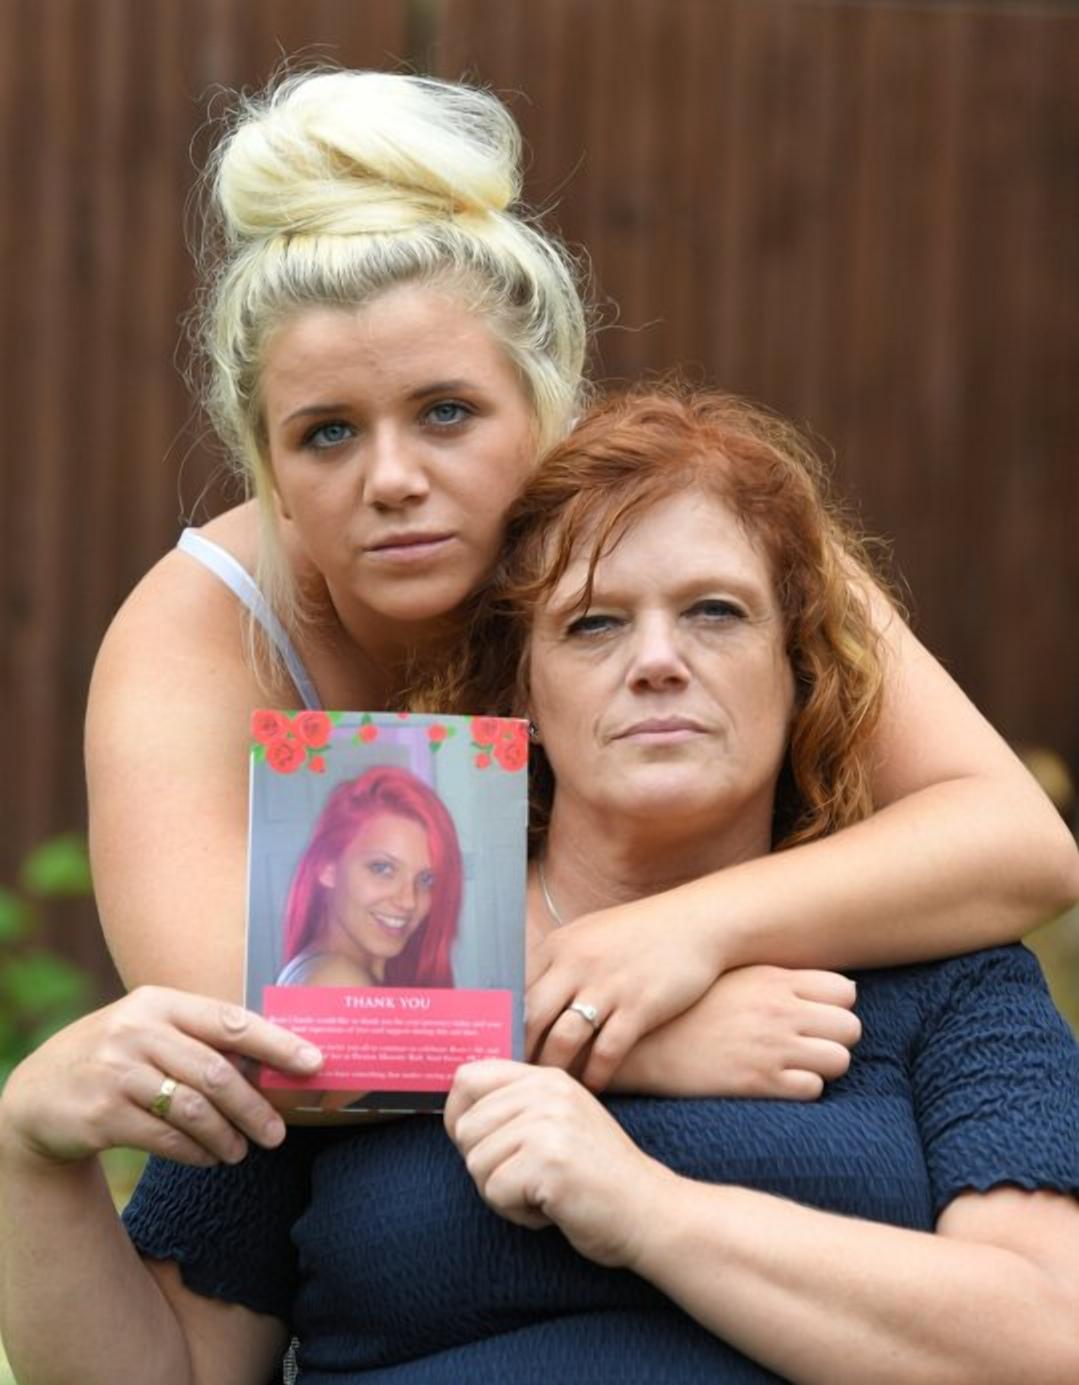 Фото: EP / SWNS / сестра и мать убитой Рози Дарбишир /